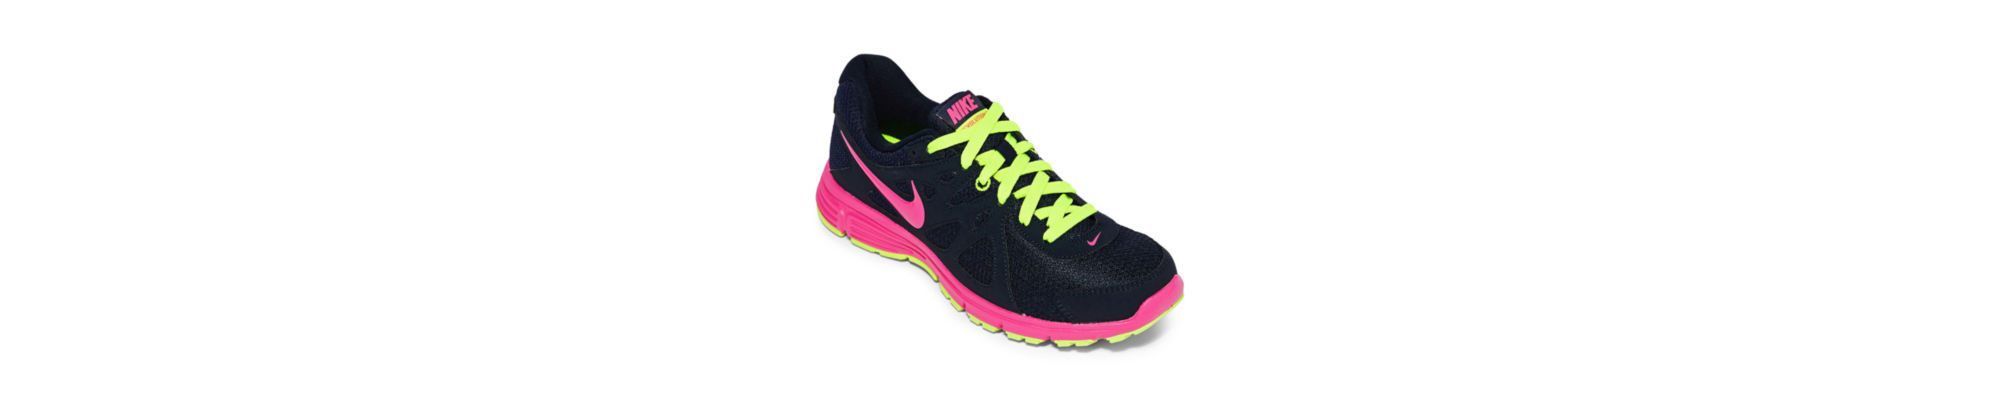 upc 826216092833 rivoluzione 2 donne scarpe nike